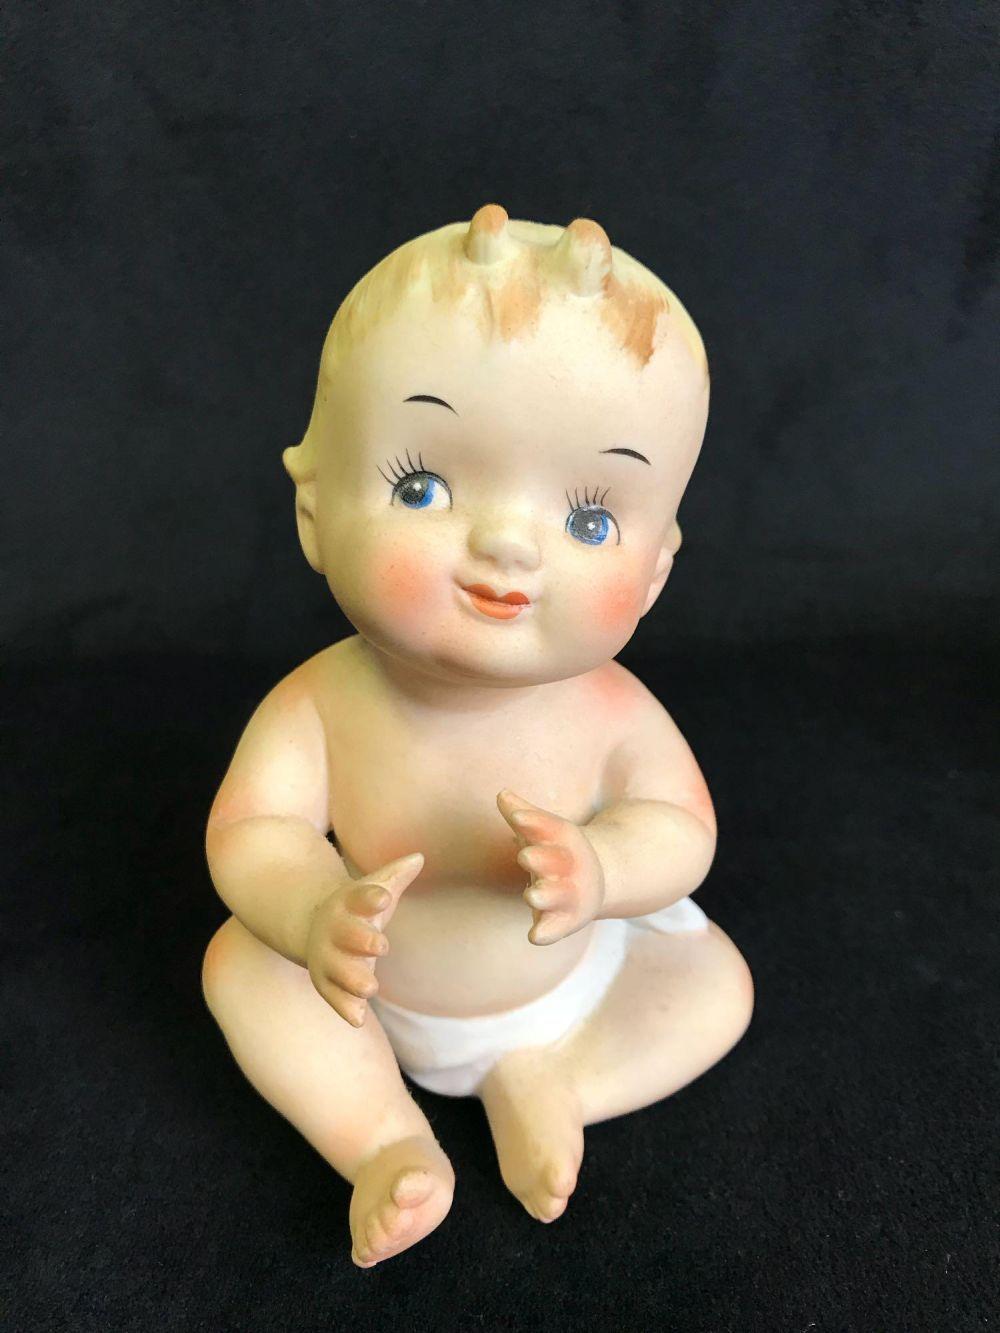 Lot 399: Vintage Lefton Kewpie Baby Porcelain Figurine Collection